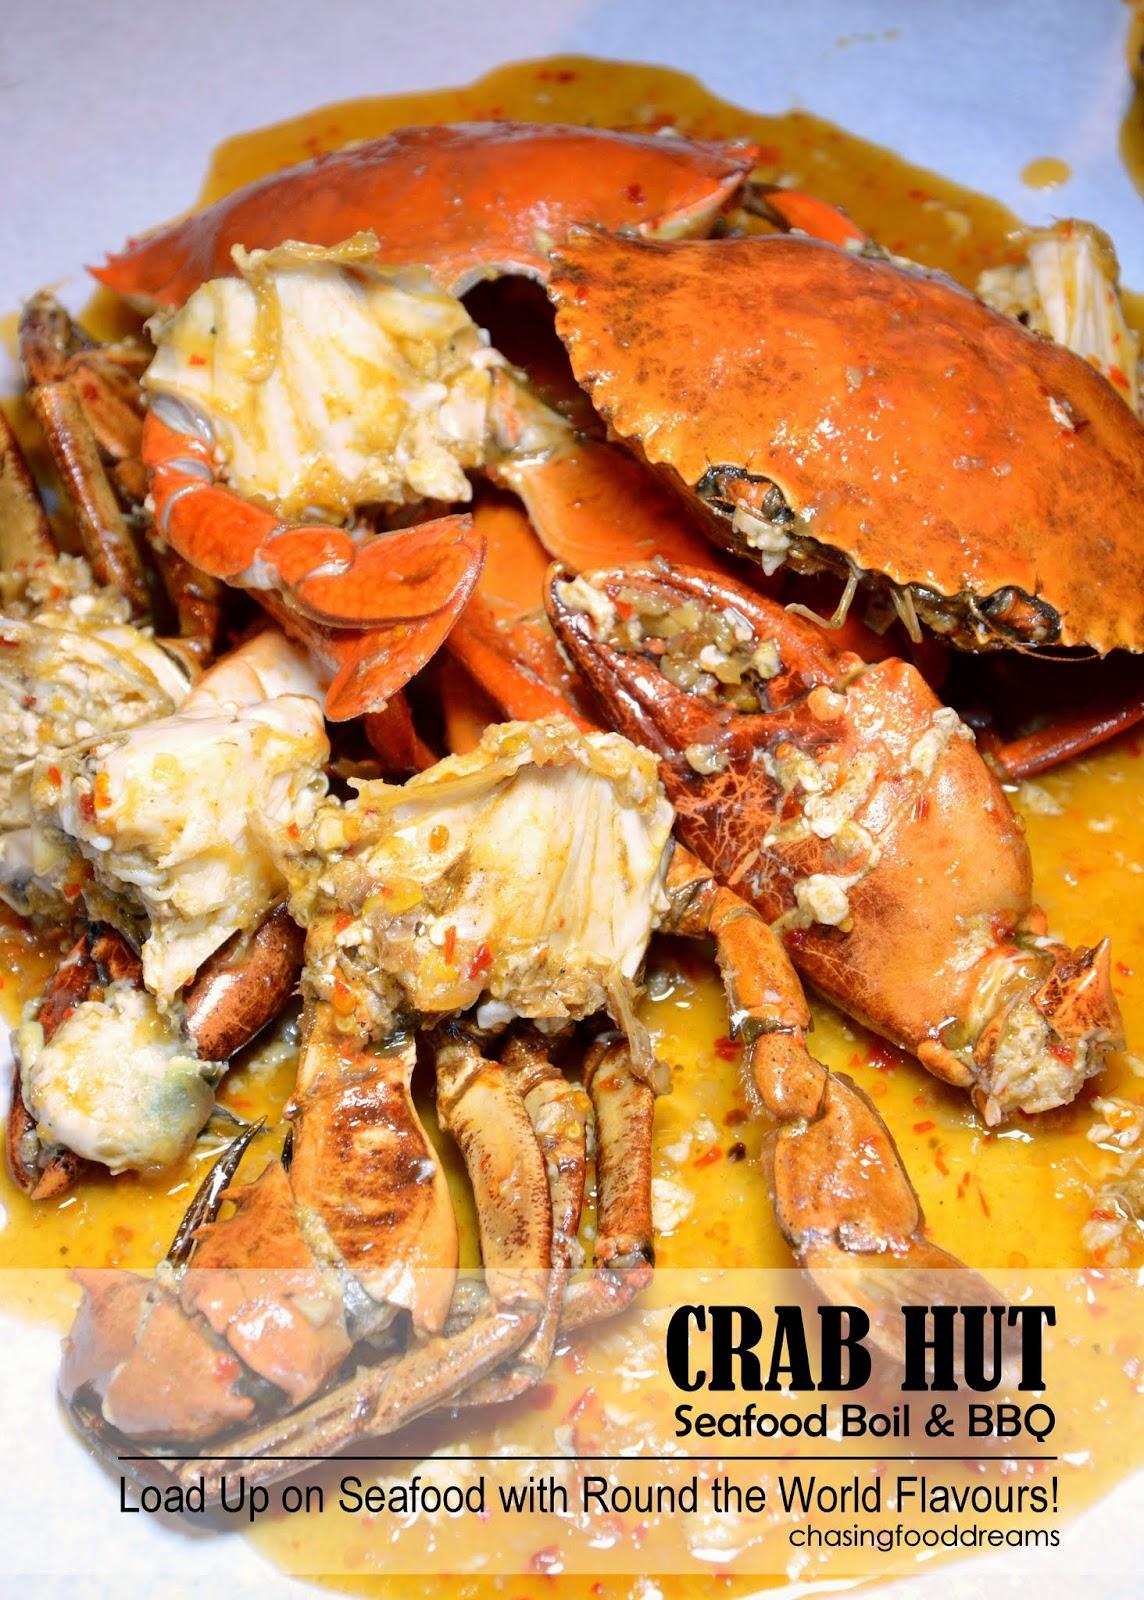 Chasing Food Dreams Crab Hut At Shaftbury Square Cyberjaya